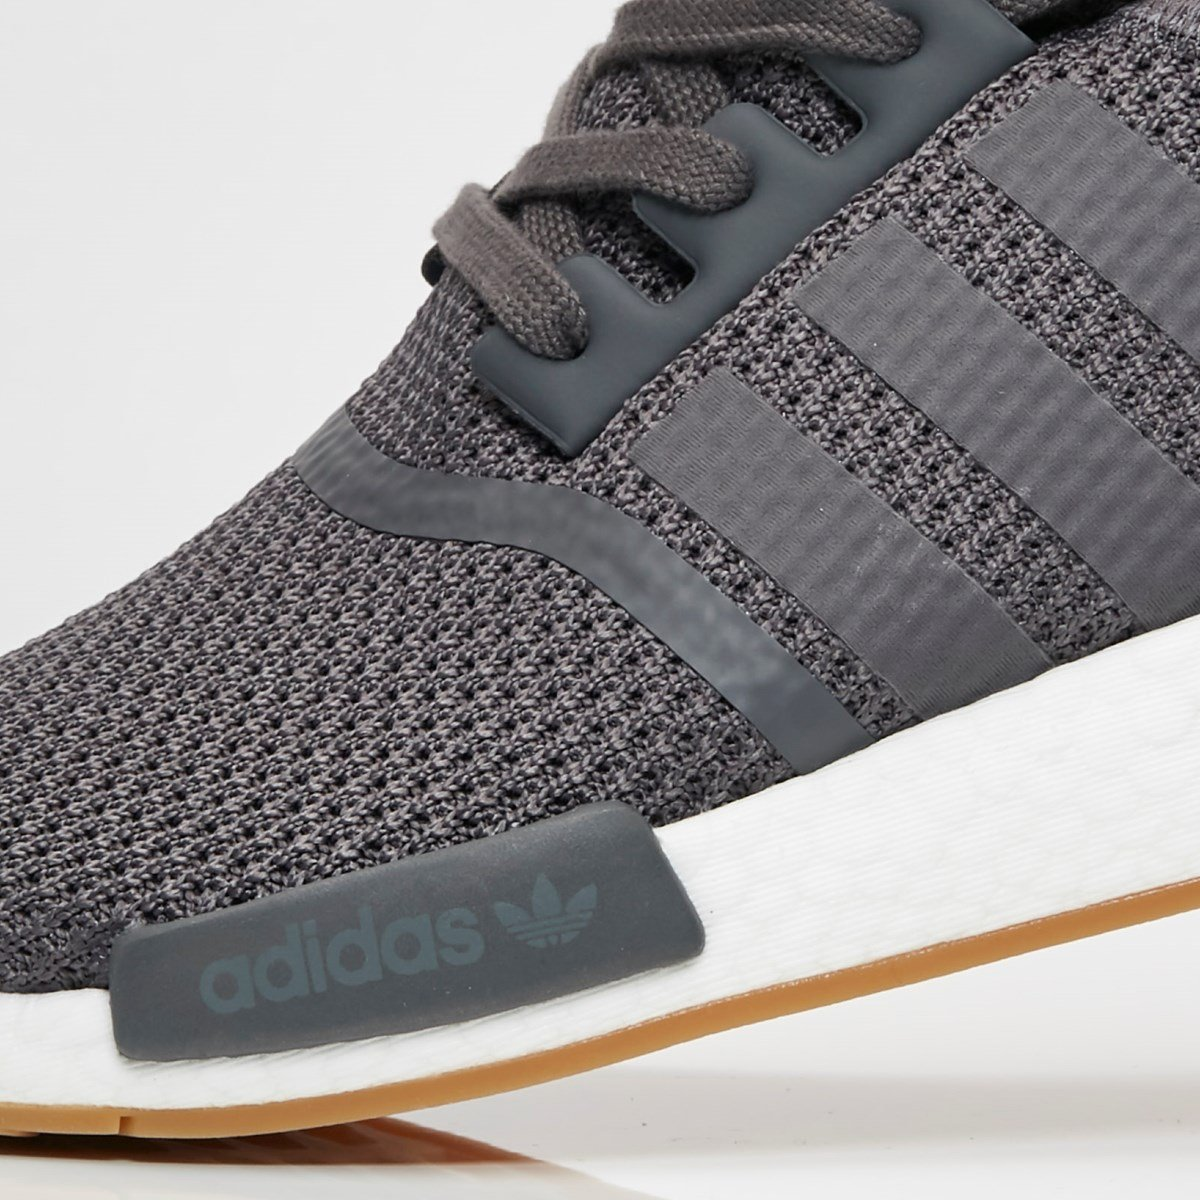 adidas NMD_R1 - B42199 - Sneakersnstuff